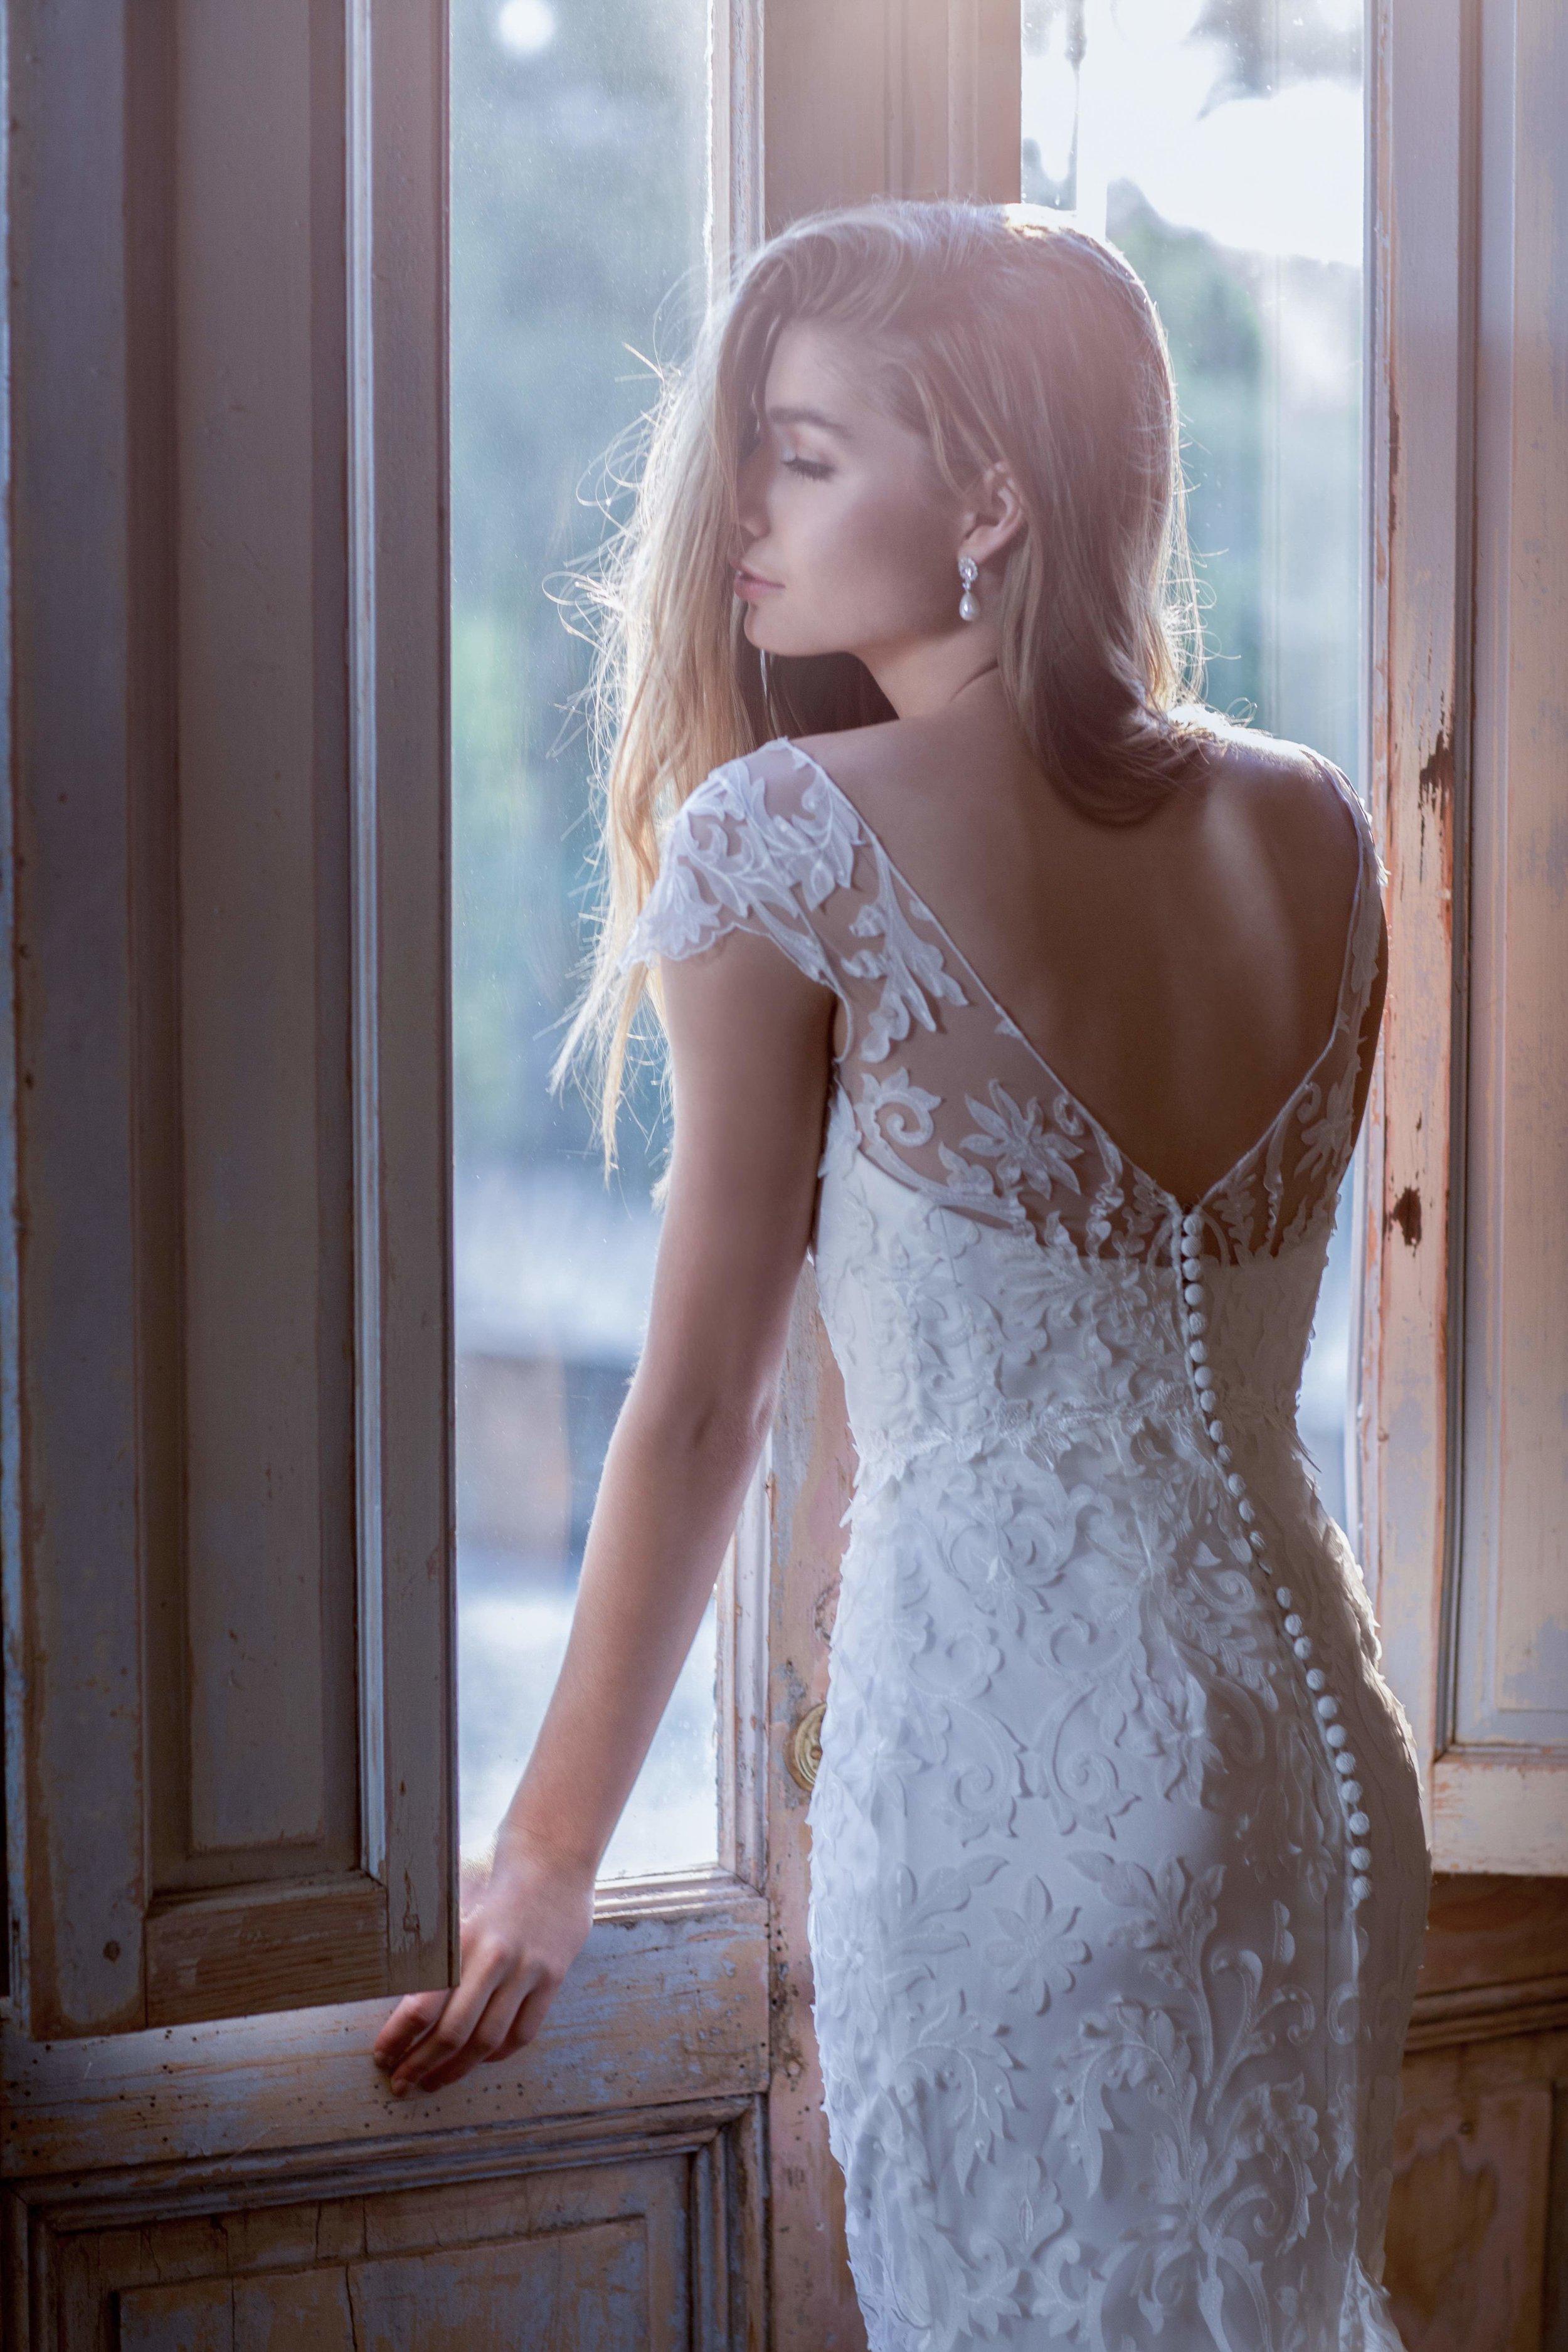 Ceremony_Collection_Windsor_Dress_Image_4 copy.jpg